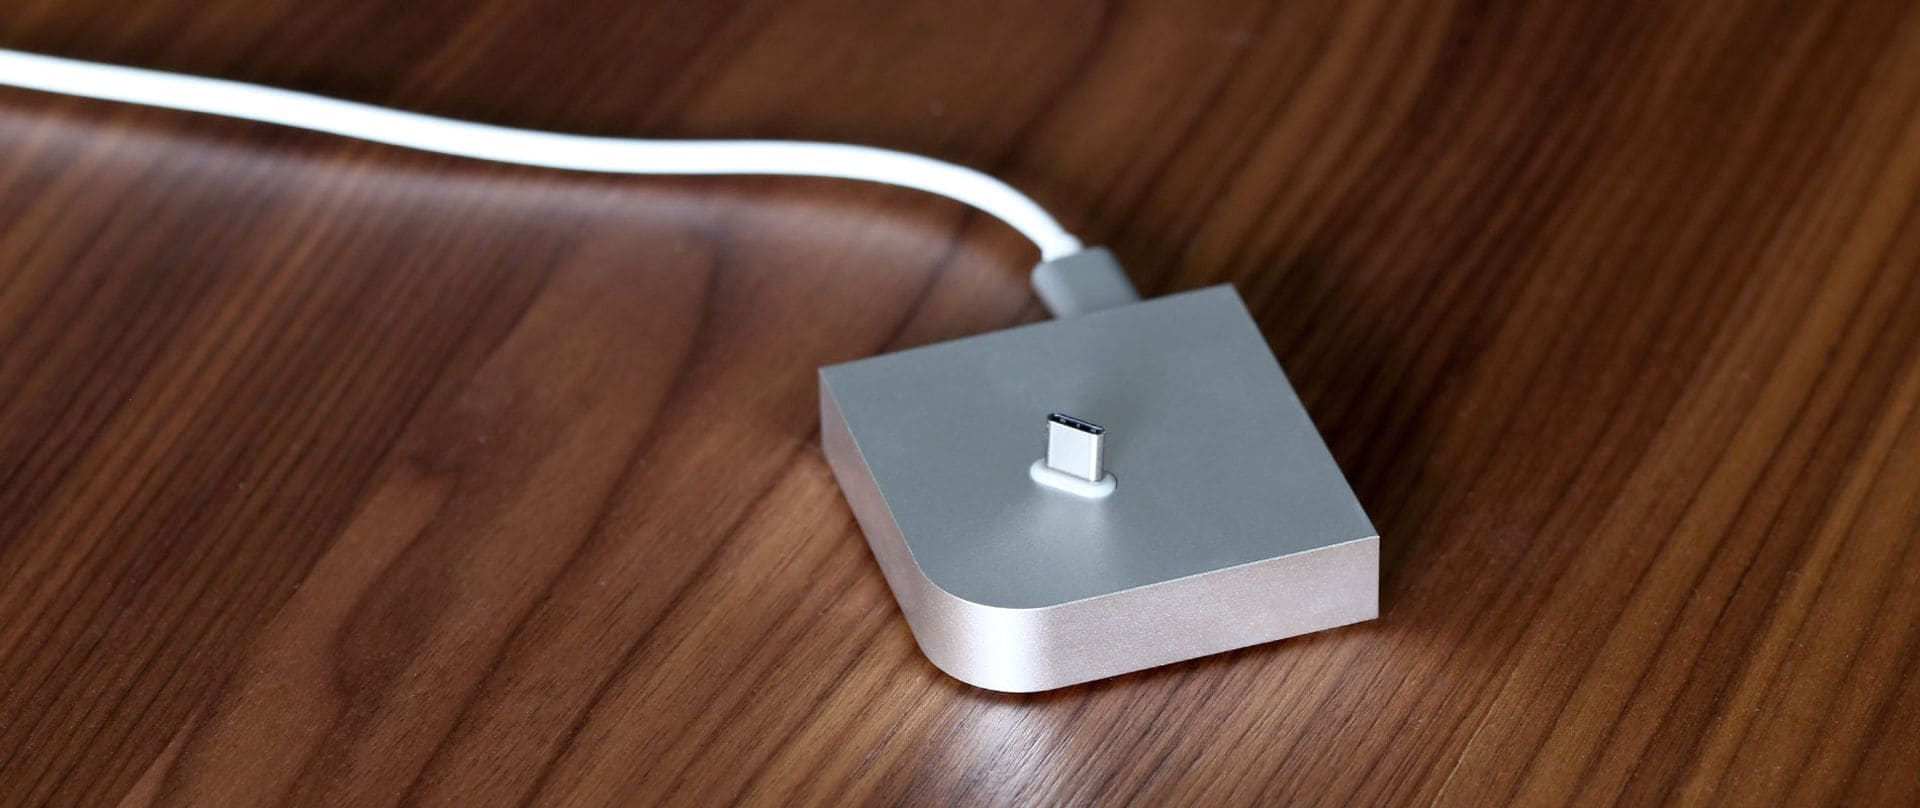 USB-C Dock Lifestyle